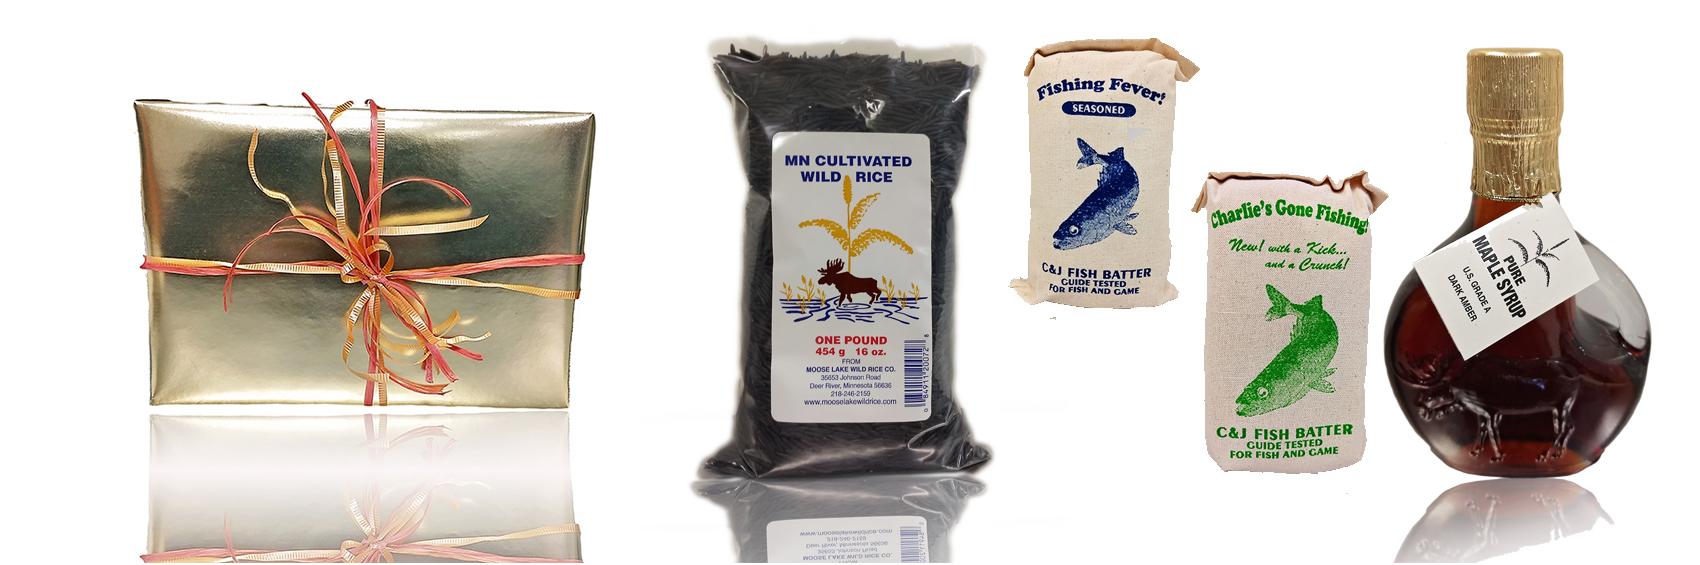 official photos 2080b a2f9a Minnesota Wild Rice - Moose Lake Wild Rice Company - Wild ...